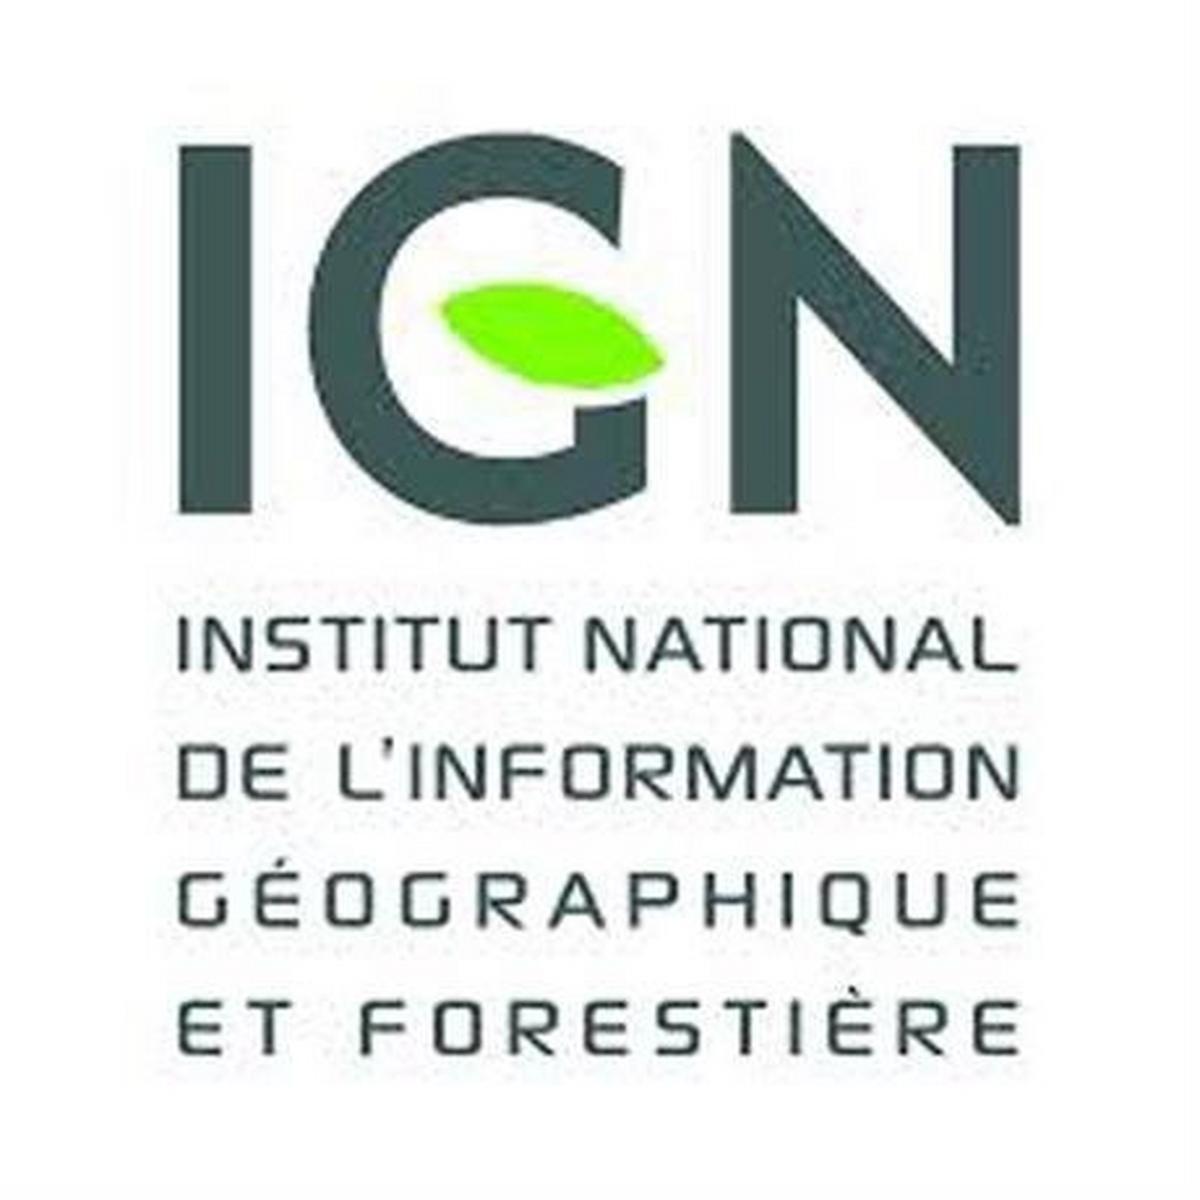 Ign Maps France Map 4252 OT Corsica: Monte Renoso - Bastelica GR20 1:25,000